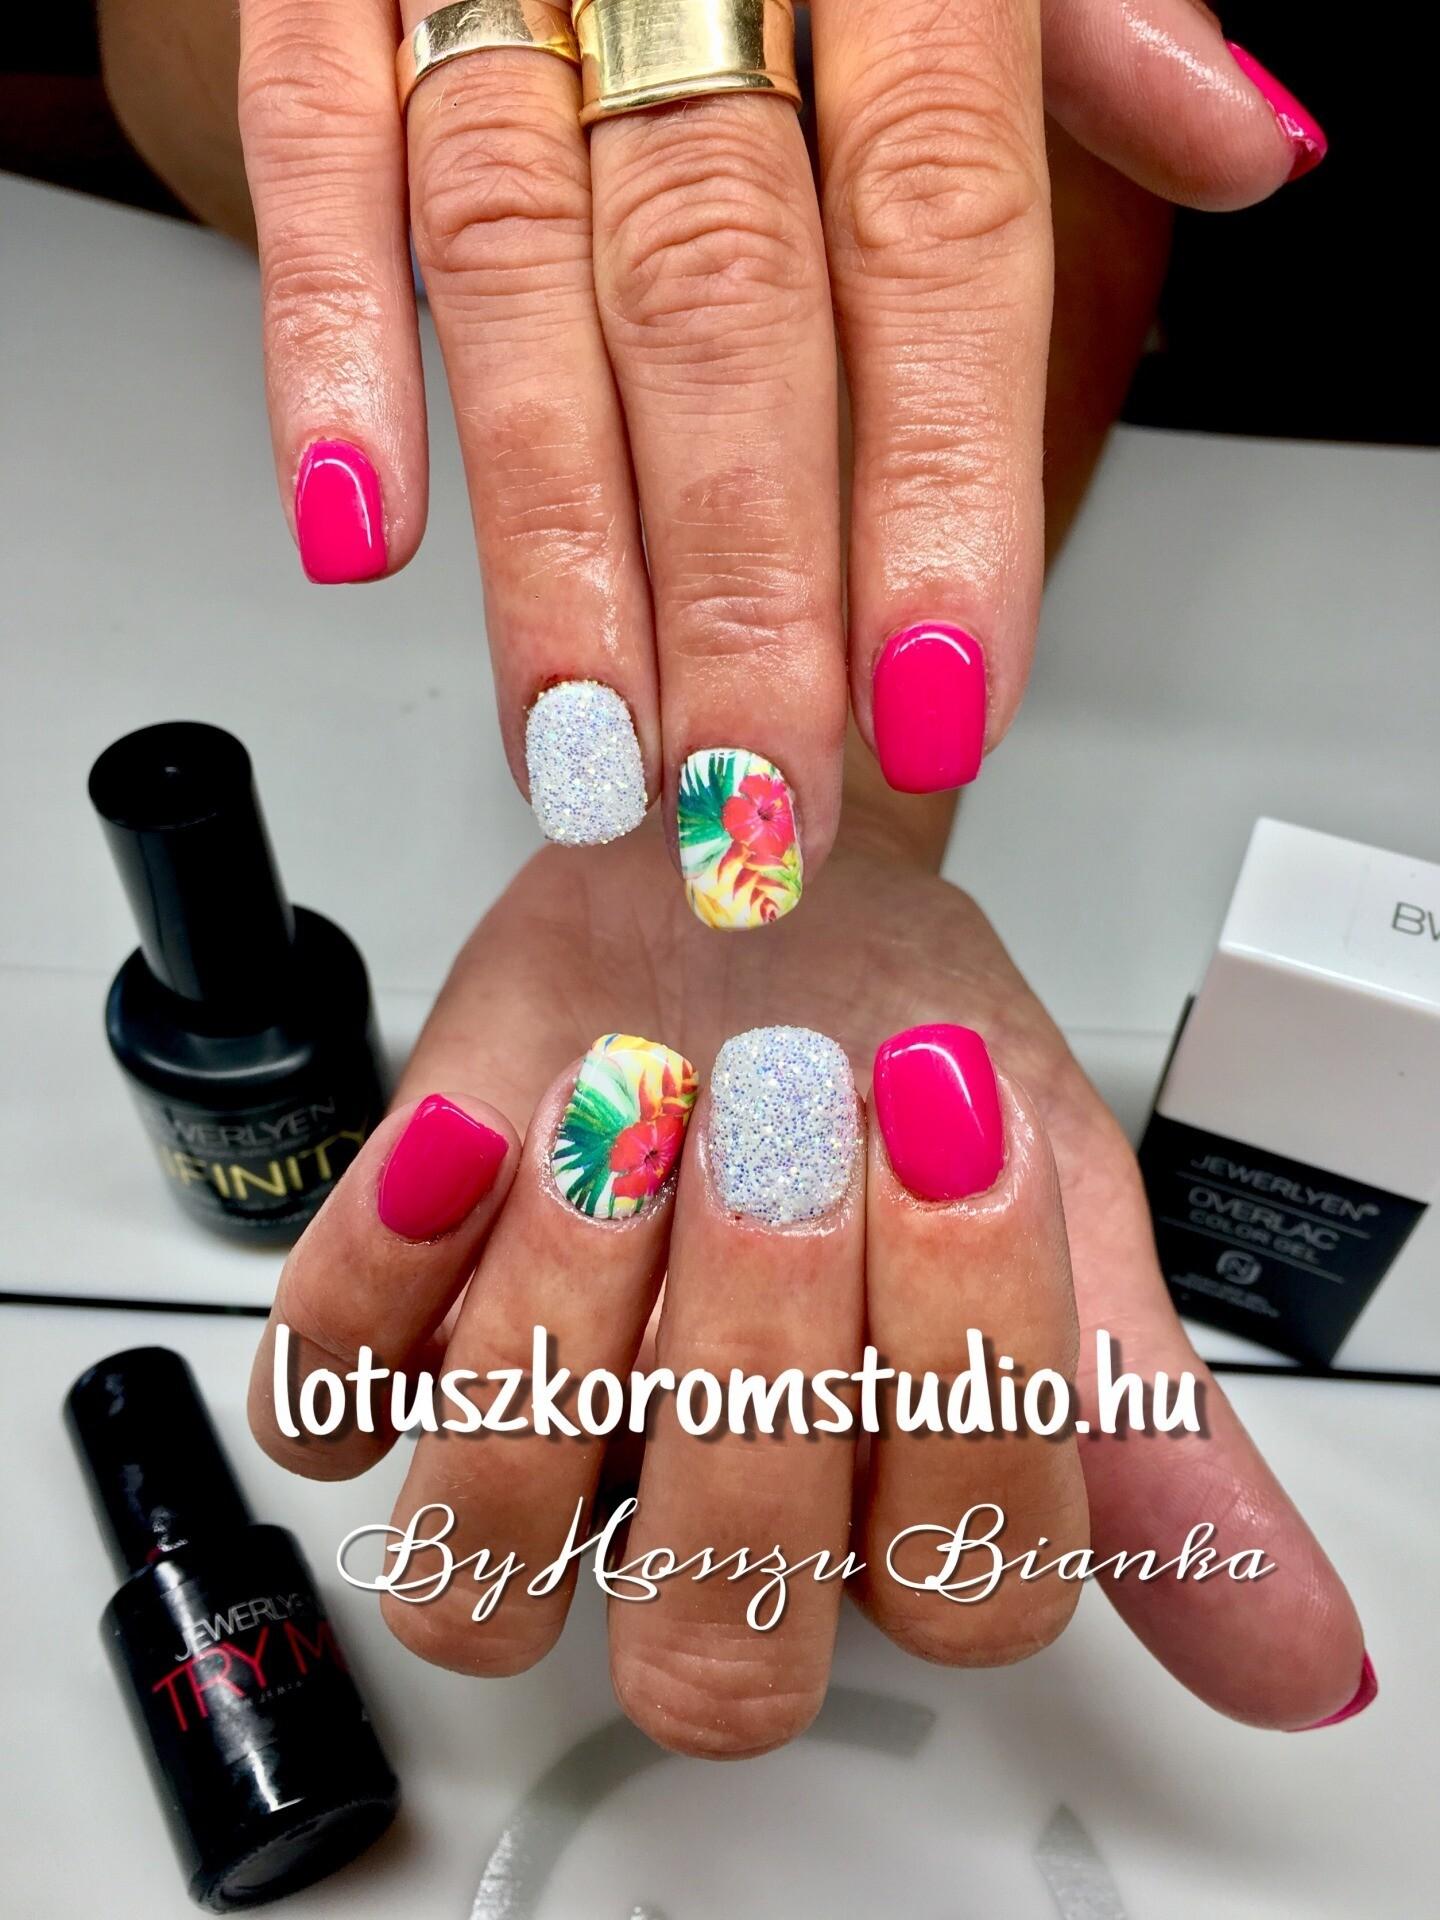 Nyari Pink Gel Lakk Lotusz Koromstudio